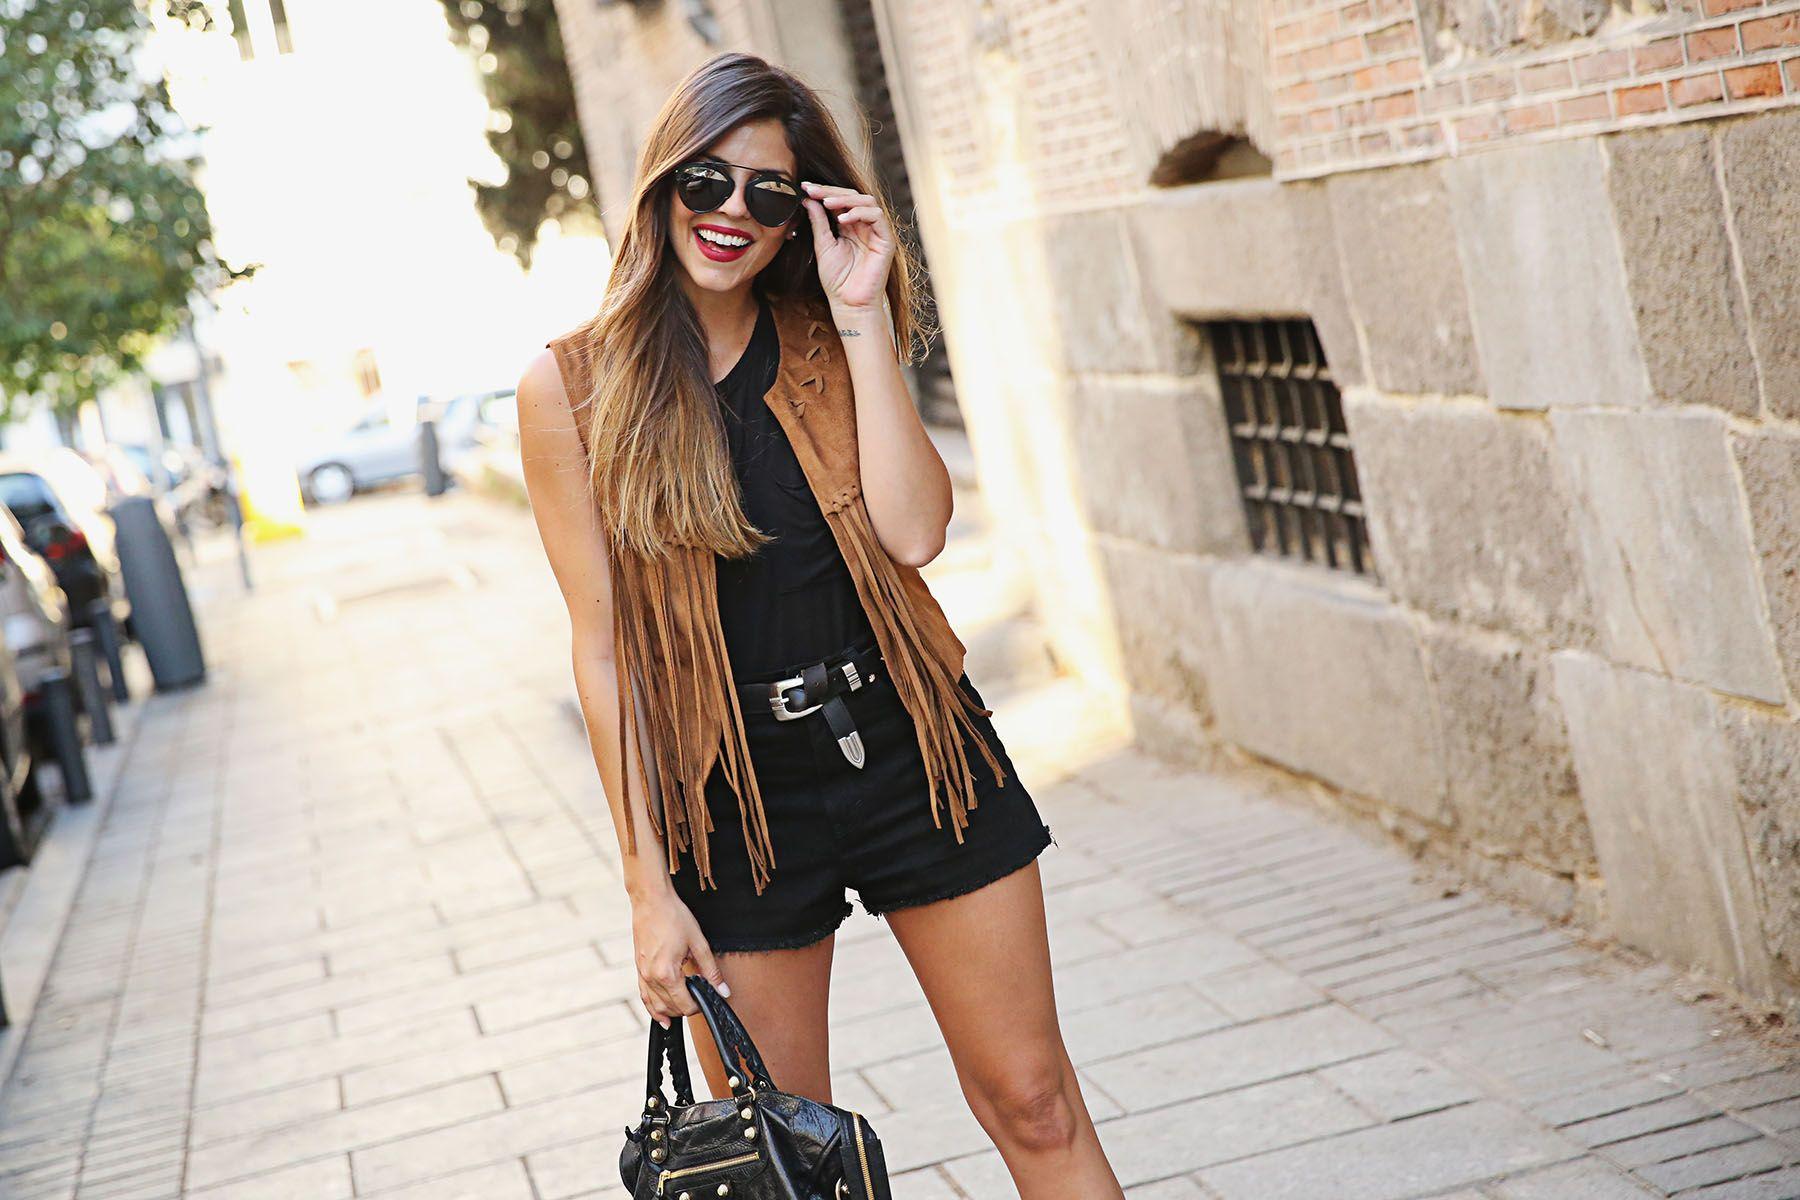 trendy-taste-look-outfit-street-style-ootd-blog-blogger-fashion-spain-moda-españa- chaleco-flecos-fringed-vest-balenciaga-mustt-botines-camperos-shorts- ... 055d884eaf0c